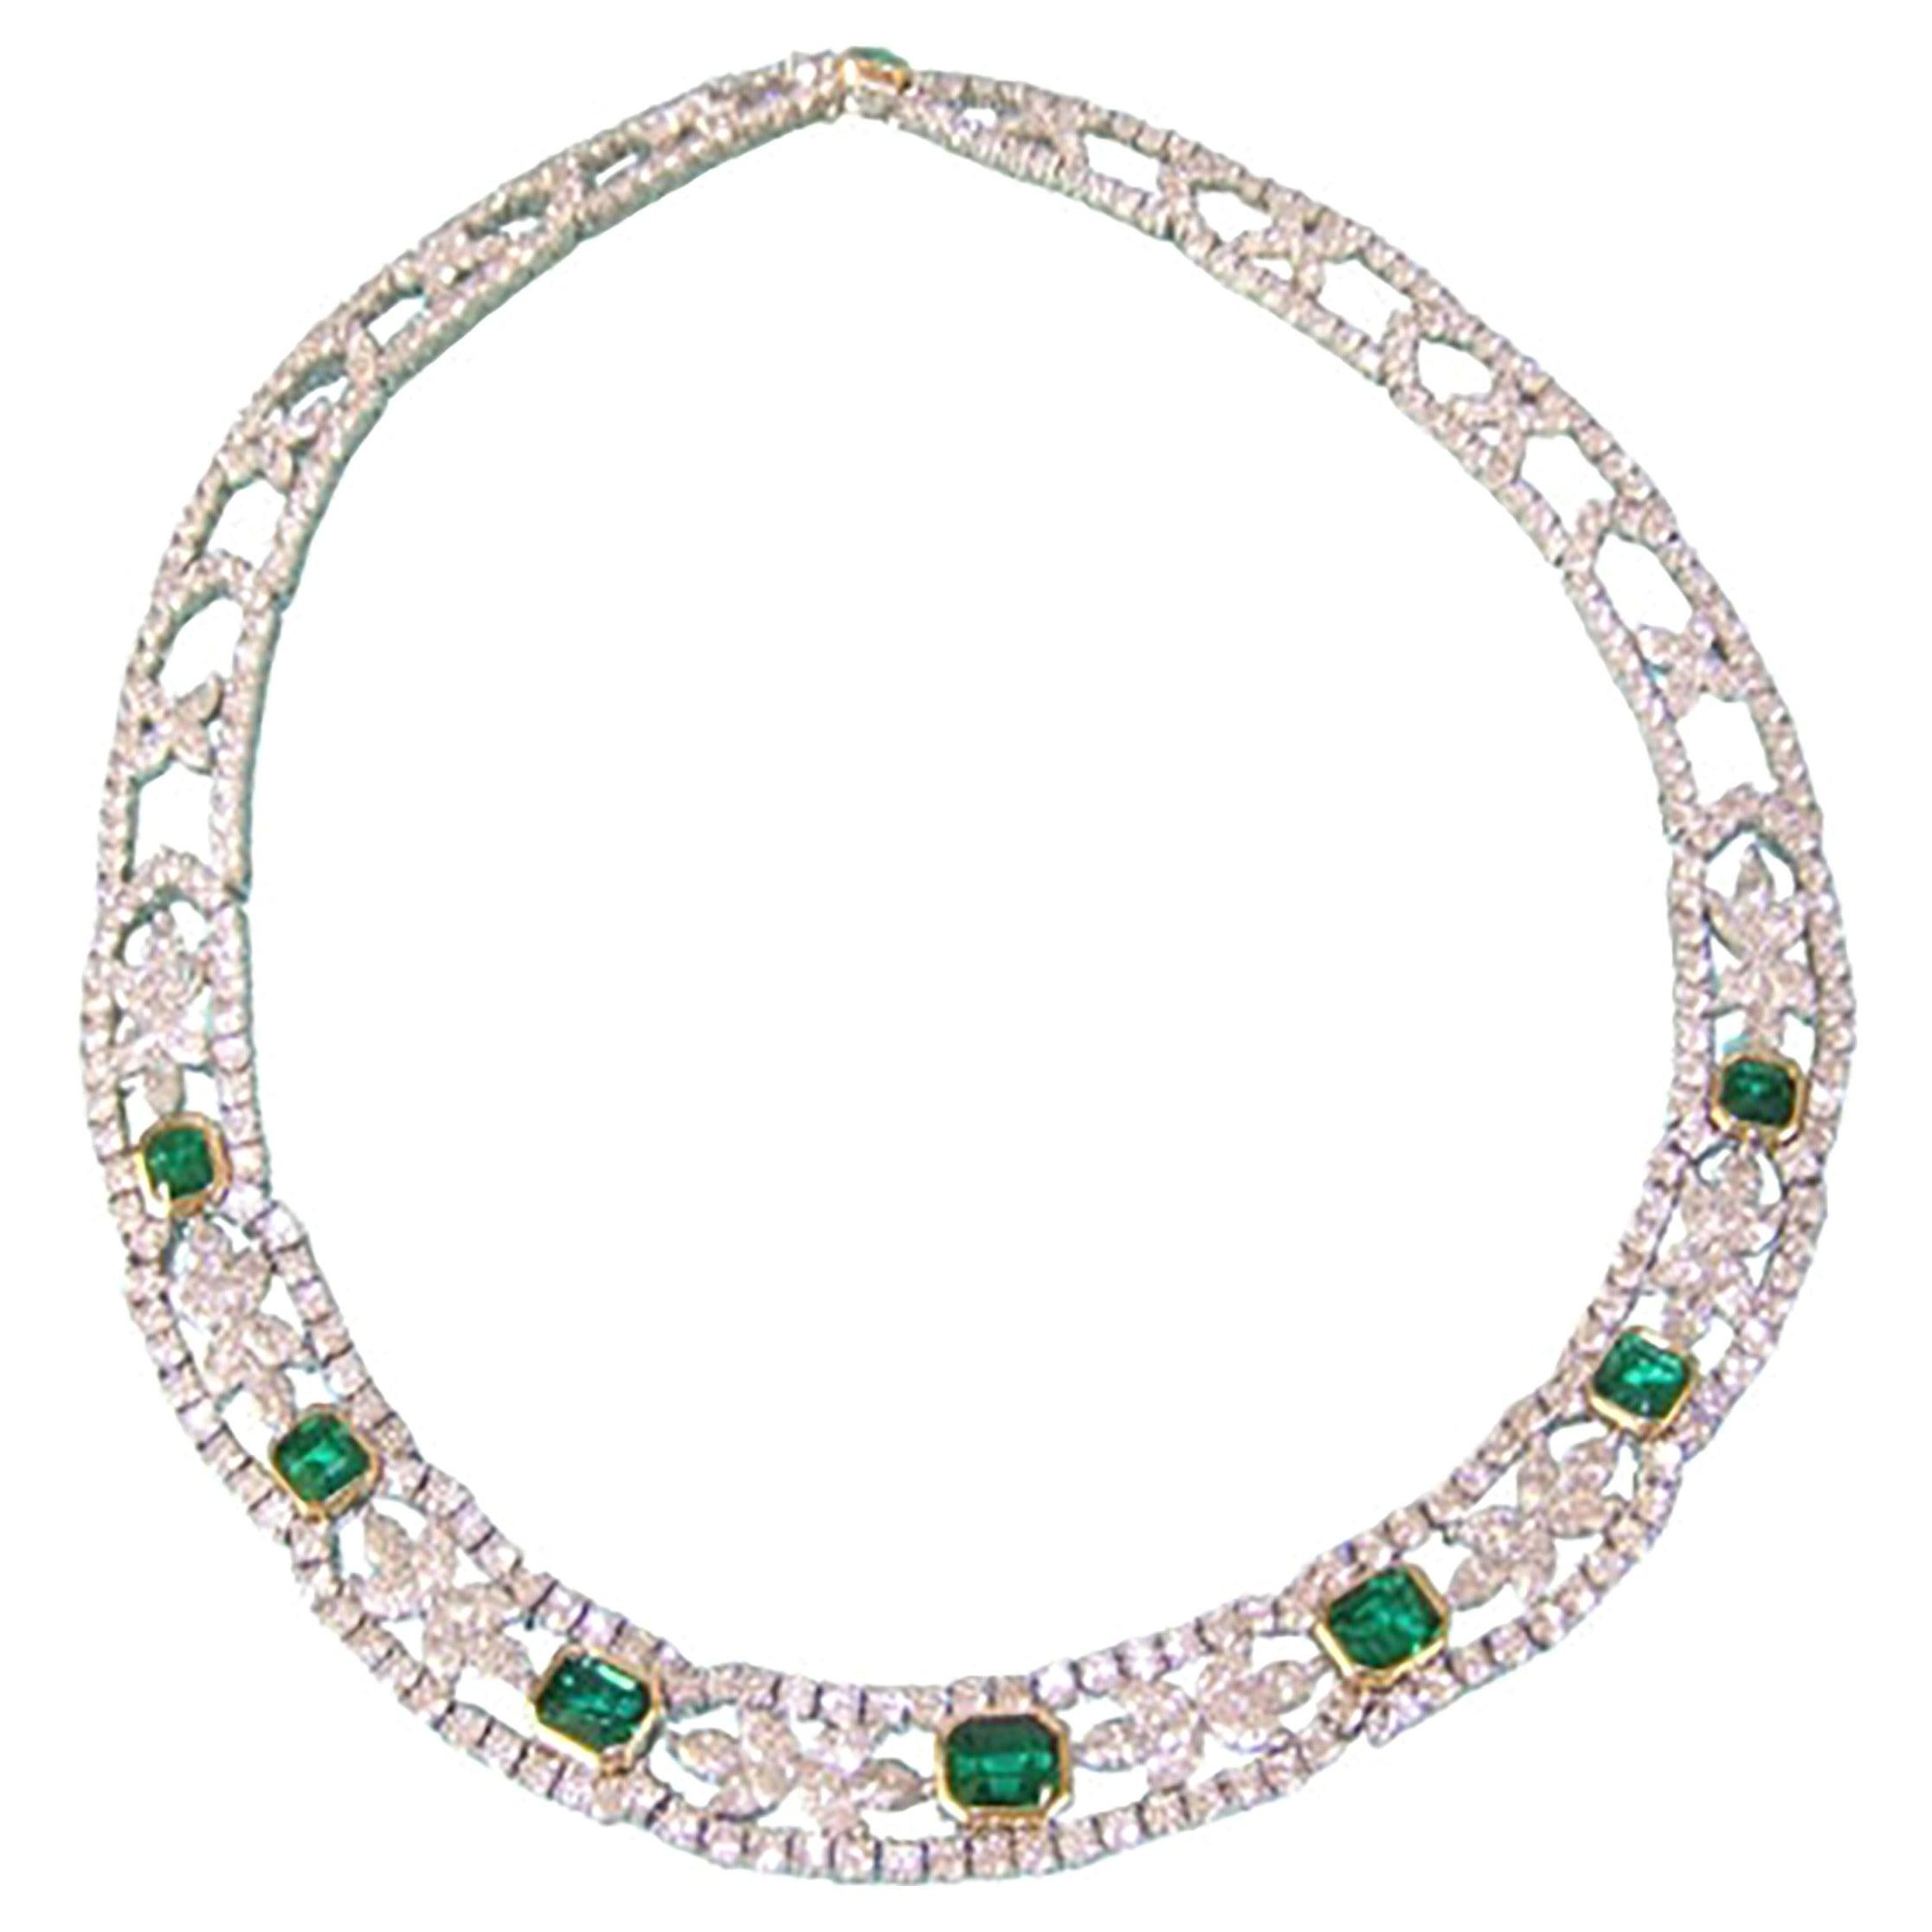 Tiffany & Co Platinum and 18k Yellow Gold Emerald Diamond Necklace